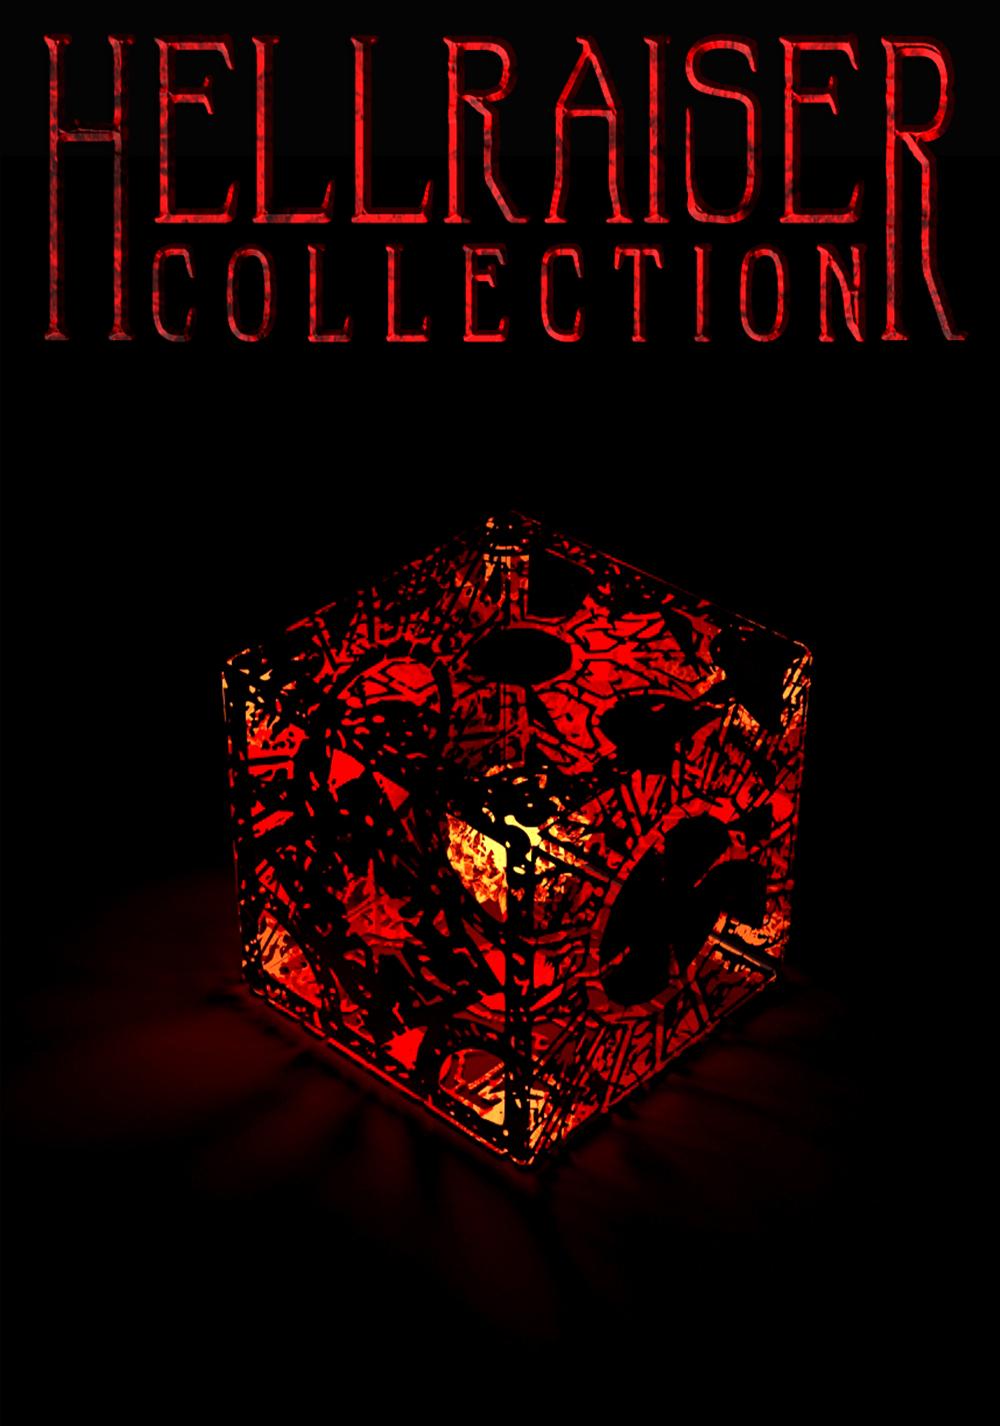 hellraiser collection movie fanart fanarttv